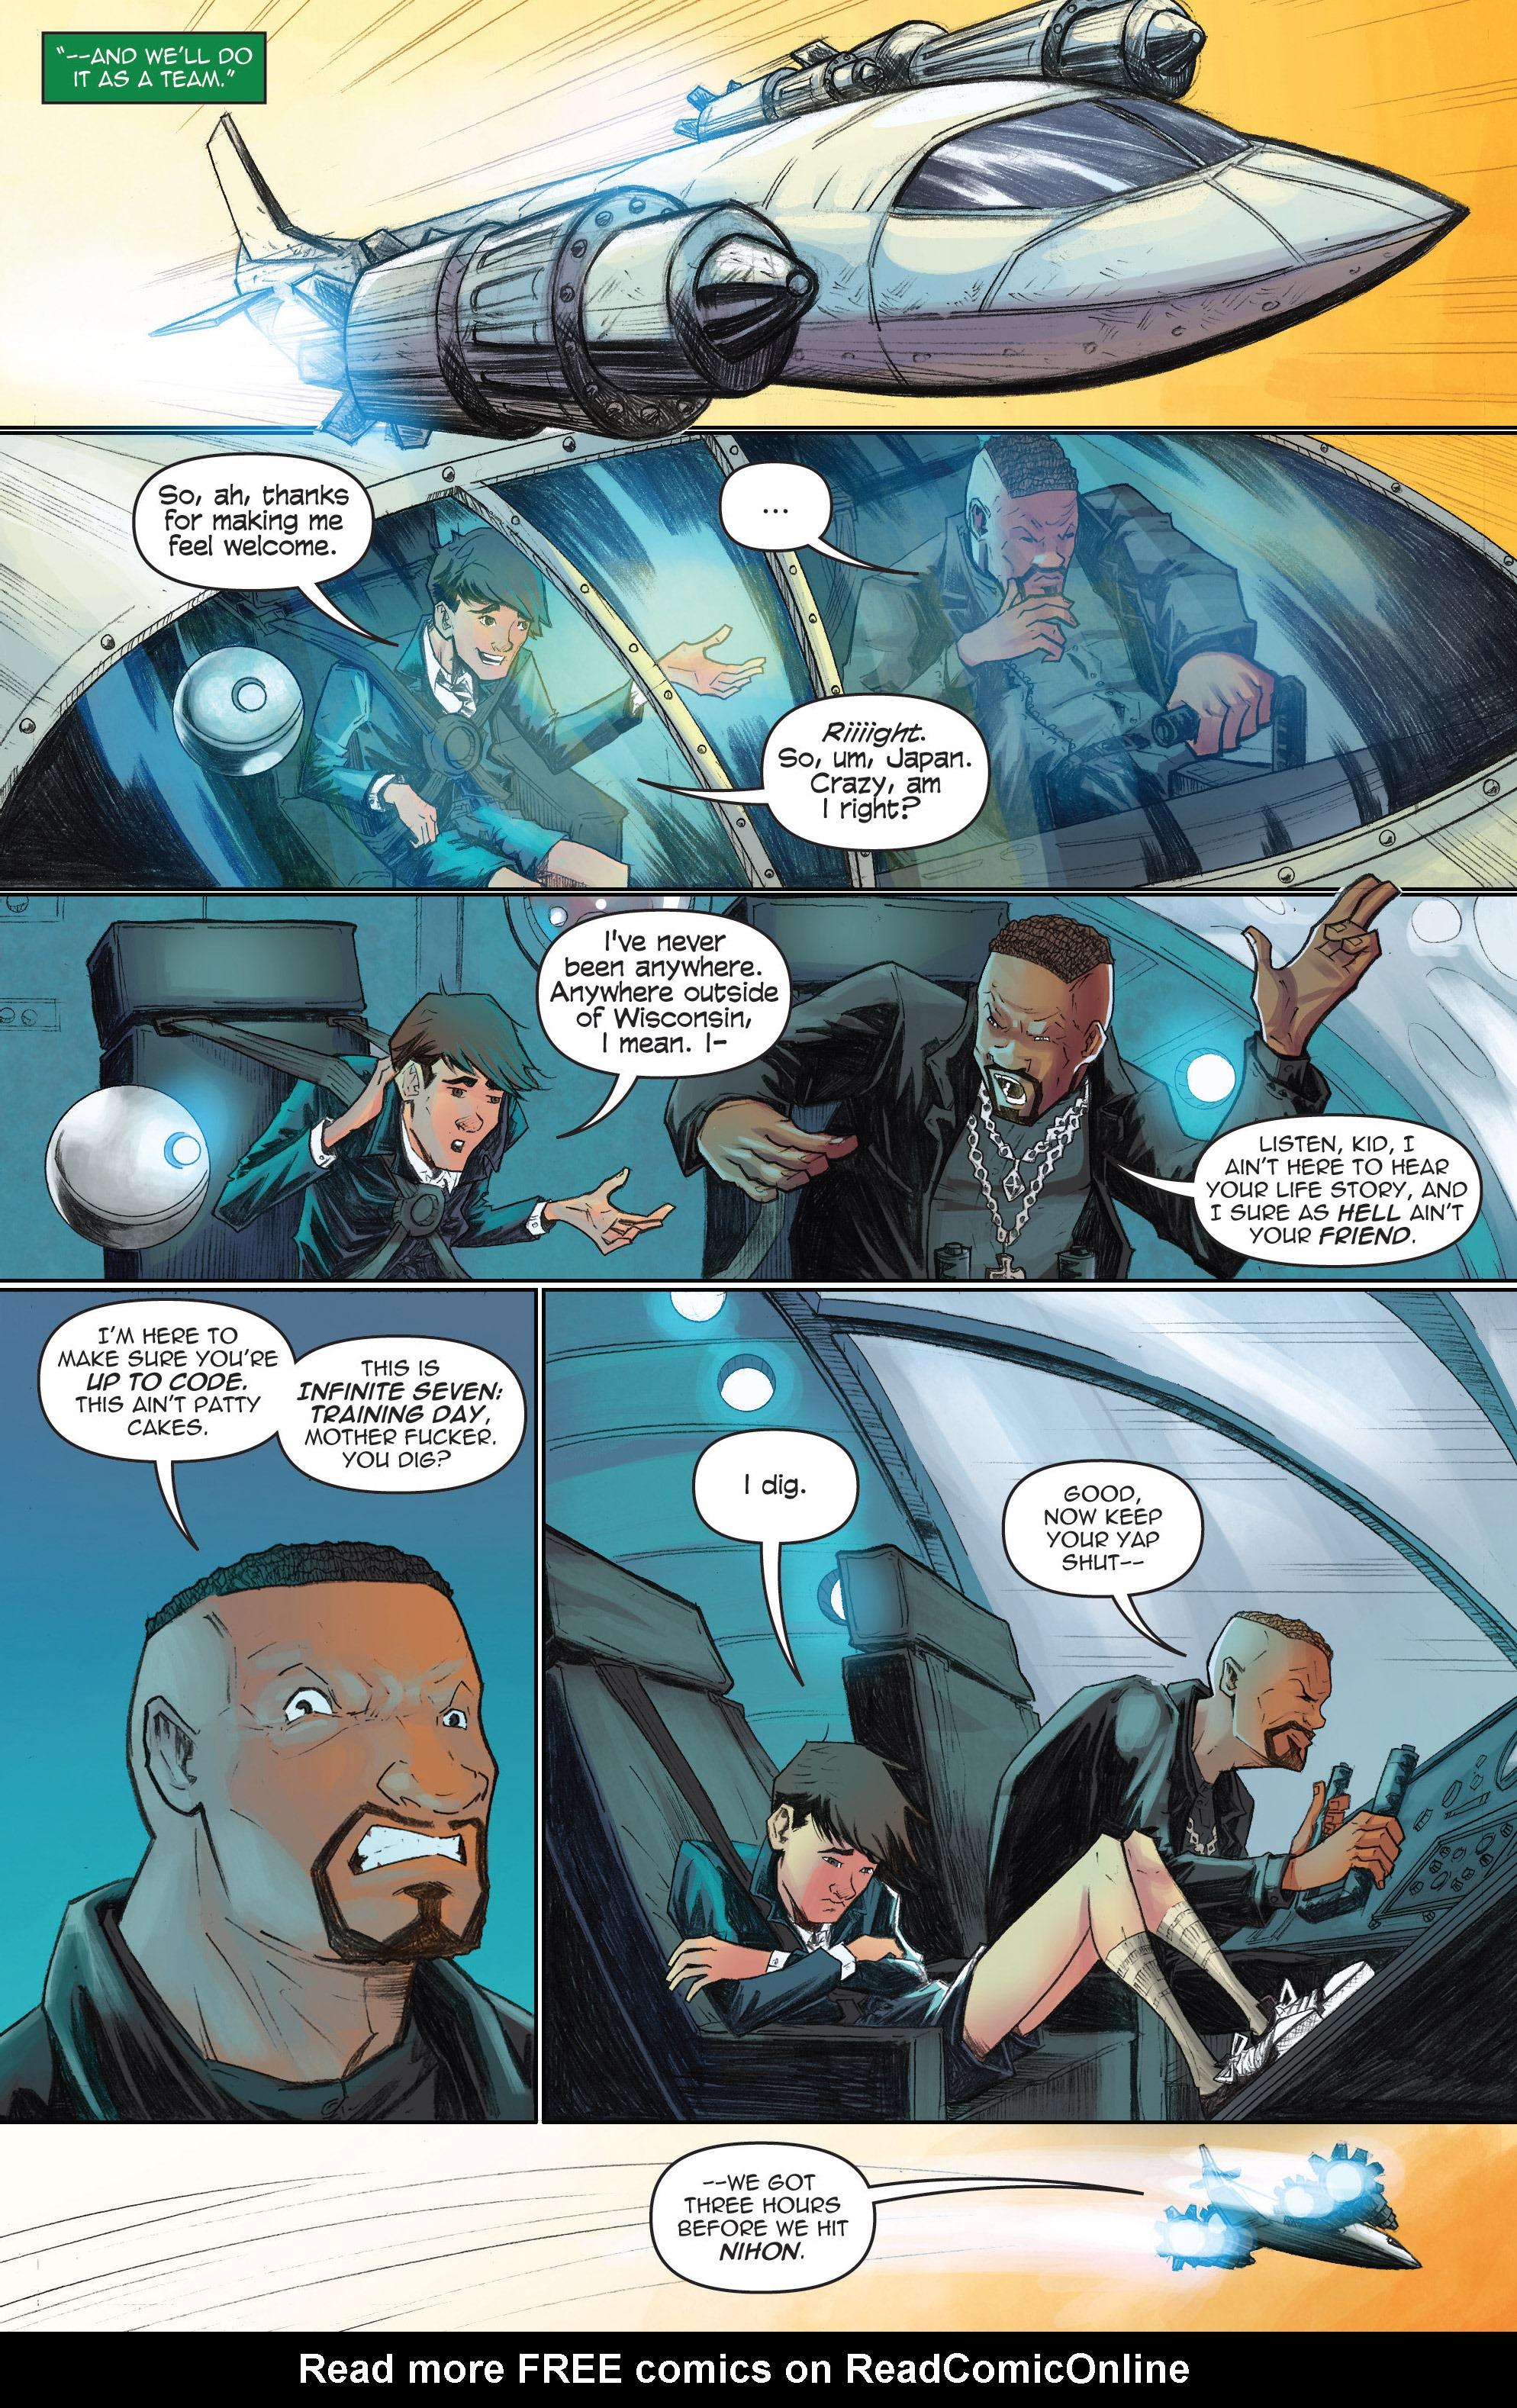 Read online Infinite Seven comic -  Issue #3 - 12